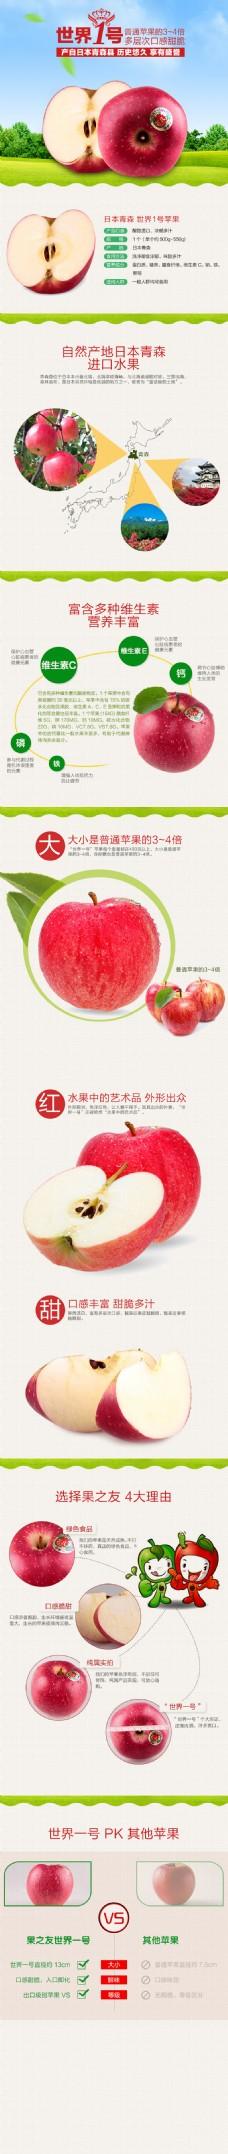 苹果详情页淘宝电商banner